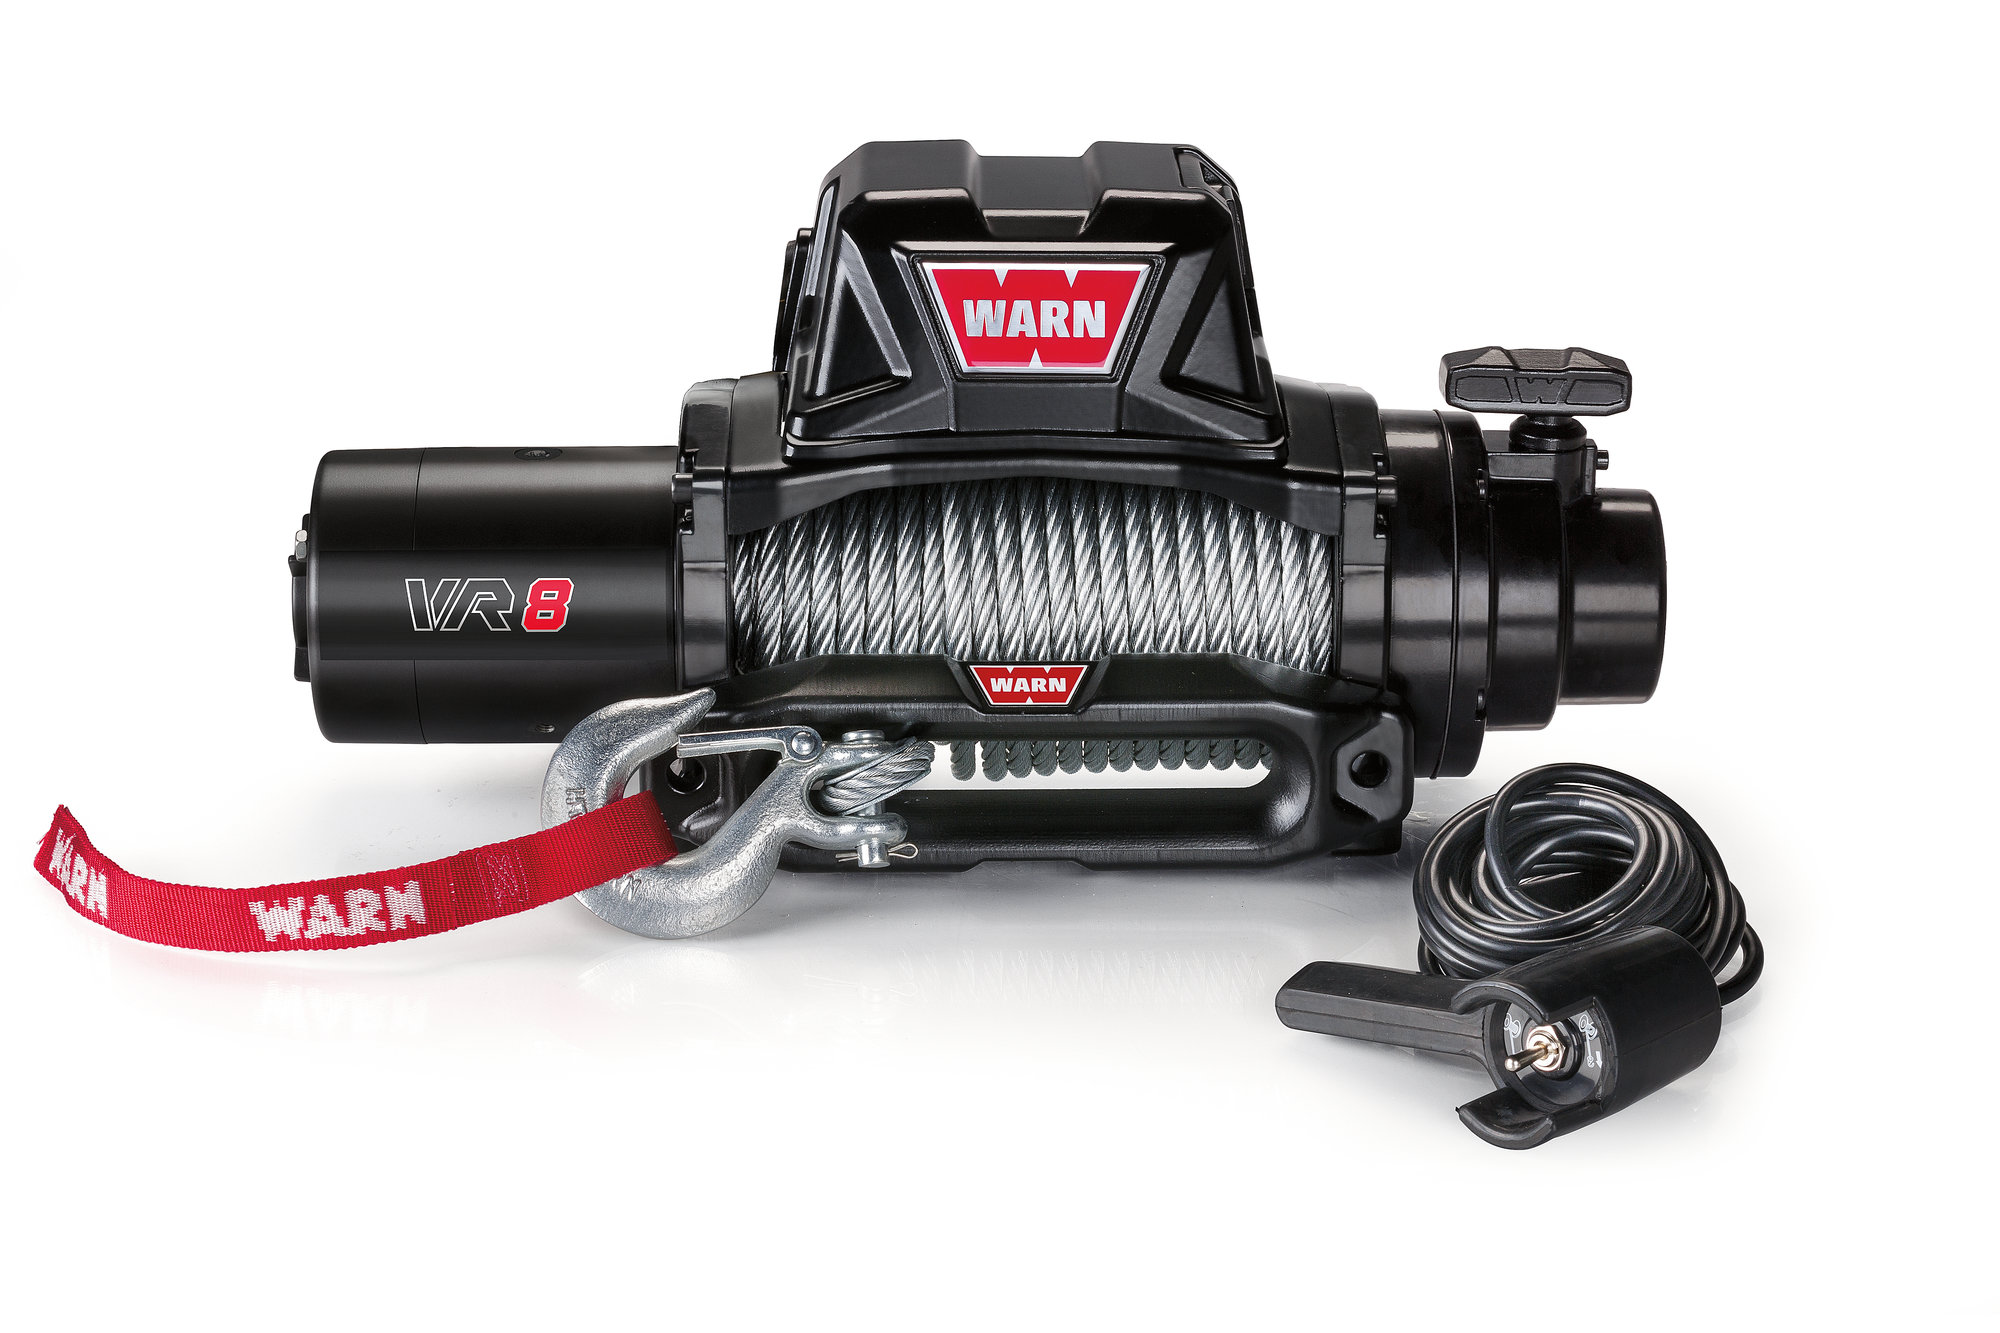 WARN 96800 VR8 Series 8000lb Winch?resize=665%2C443&ssl=1 wiring diagram for winch ramsey re 12000 old ramsey winch wiring ramsey re 12000 winch wiring diagram at n-0.co